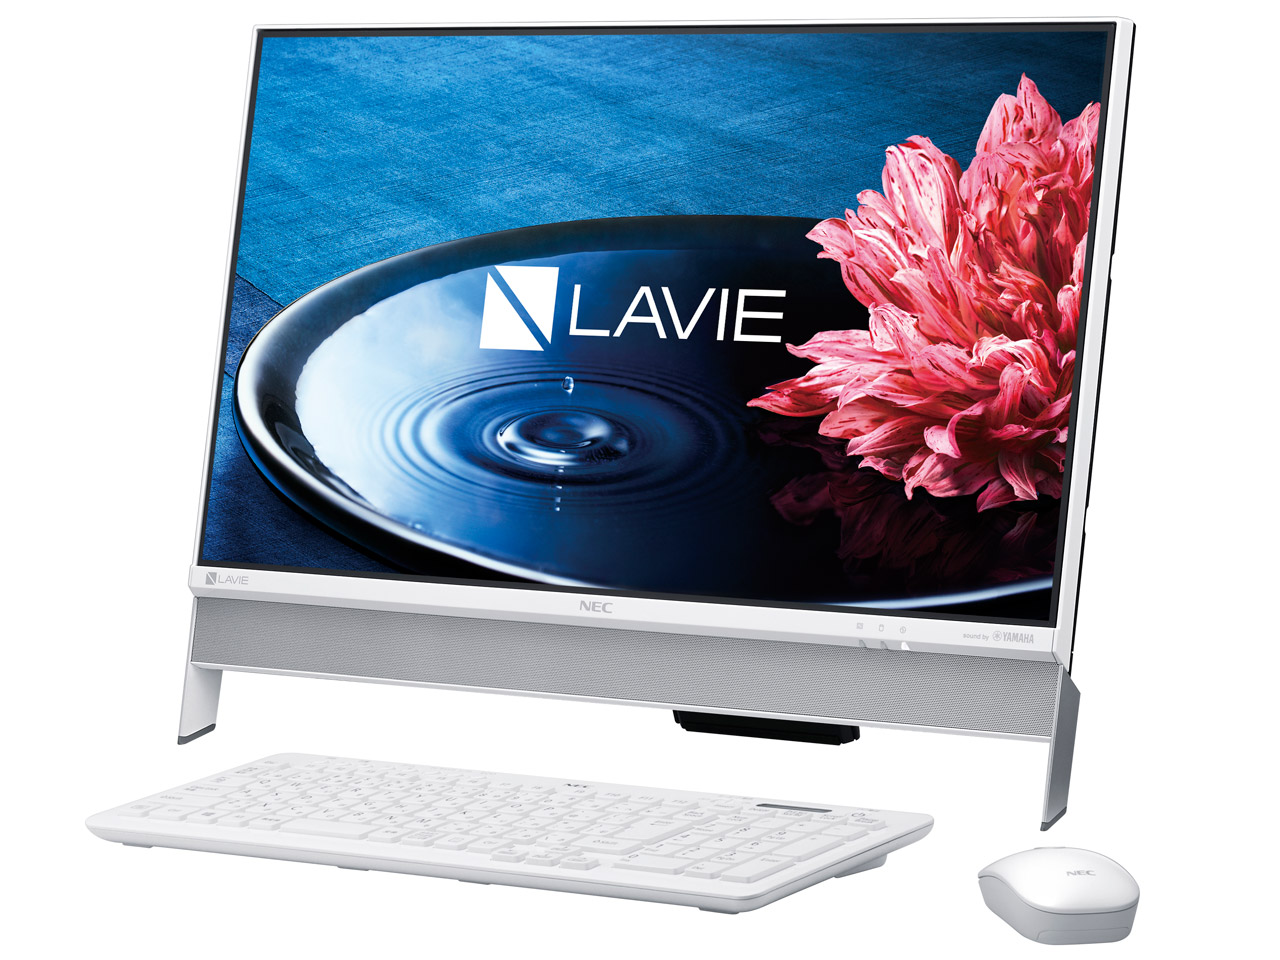 LAVIE Desk All-in-one DA350/EAW PC-DA350EAW